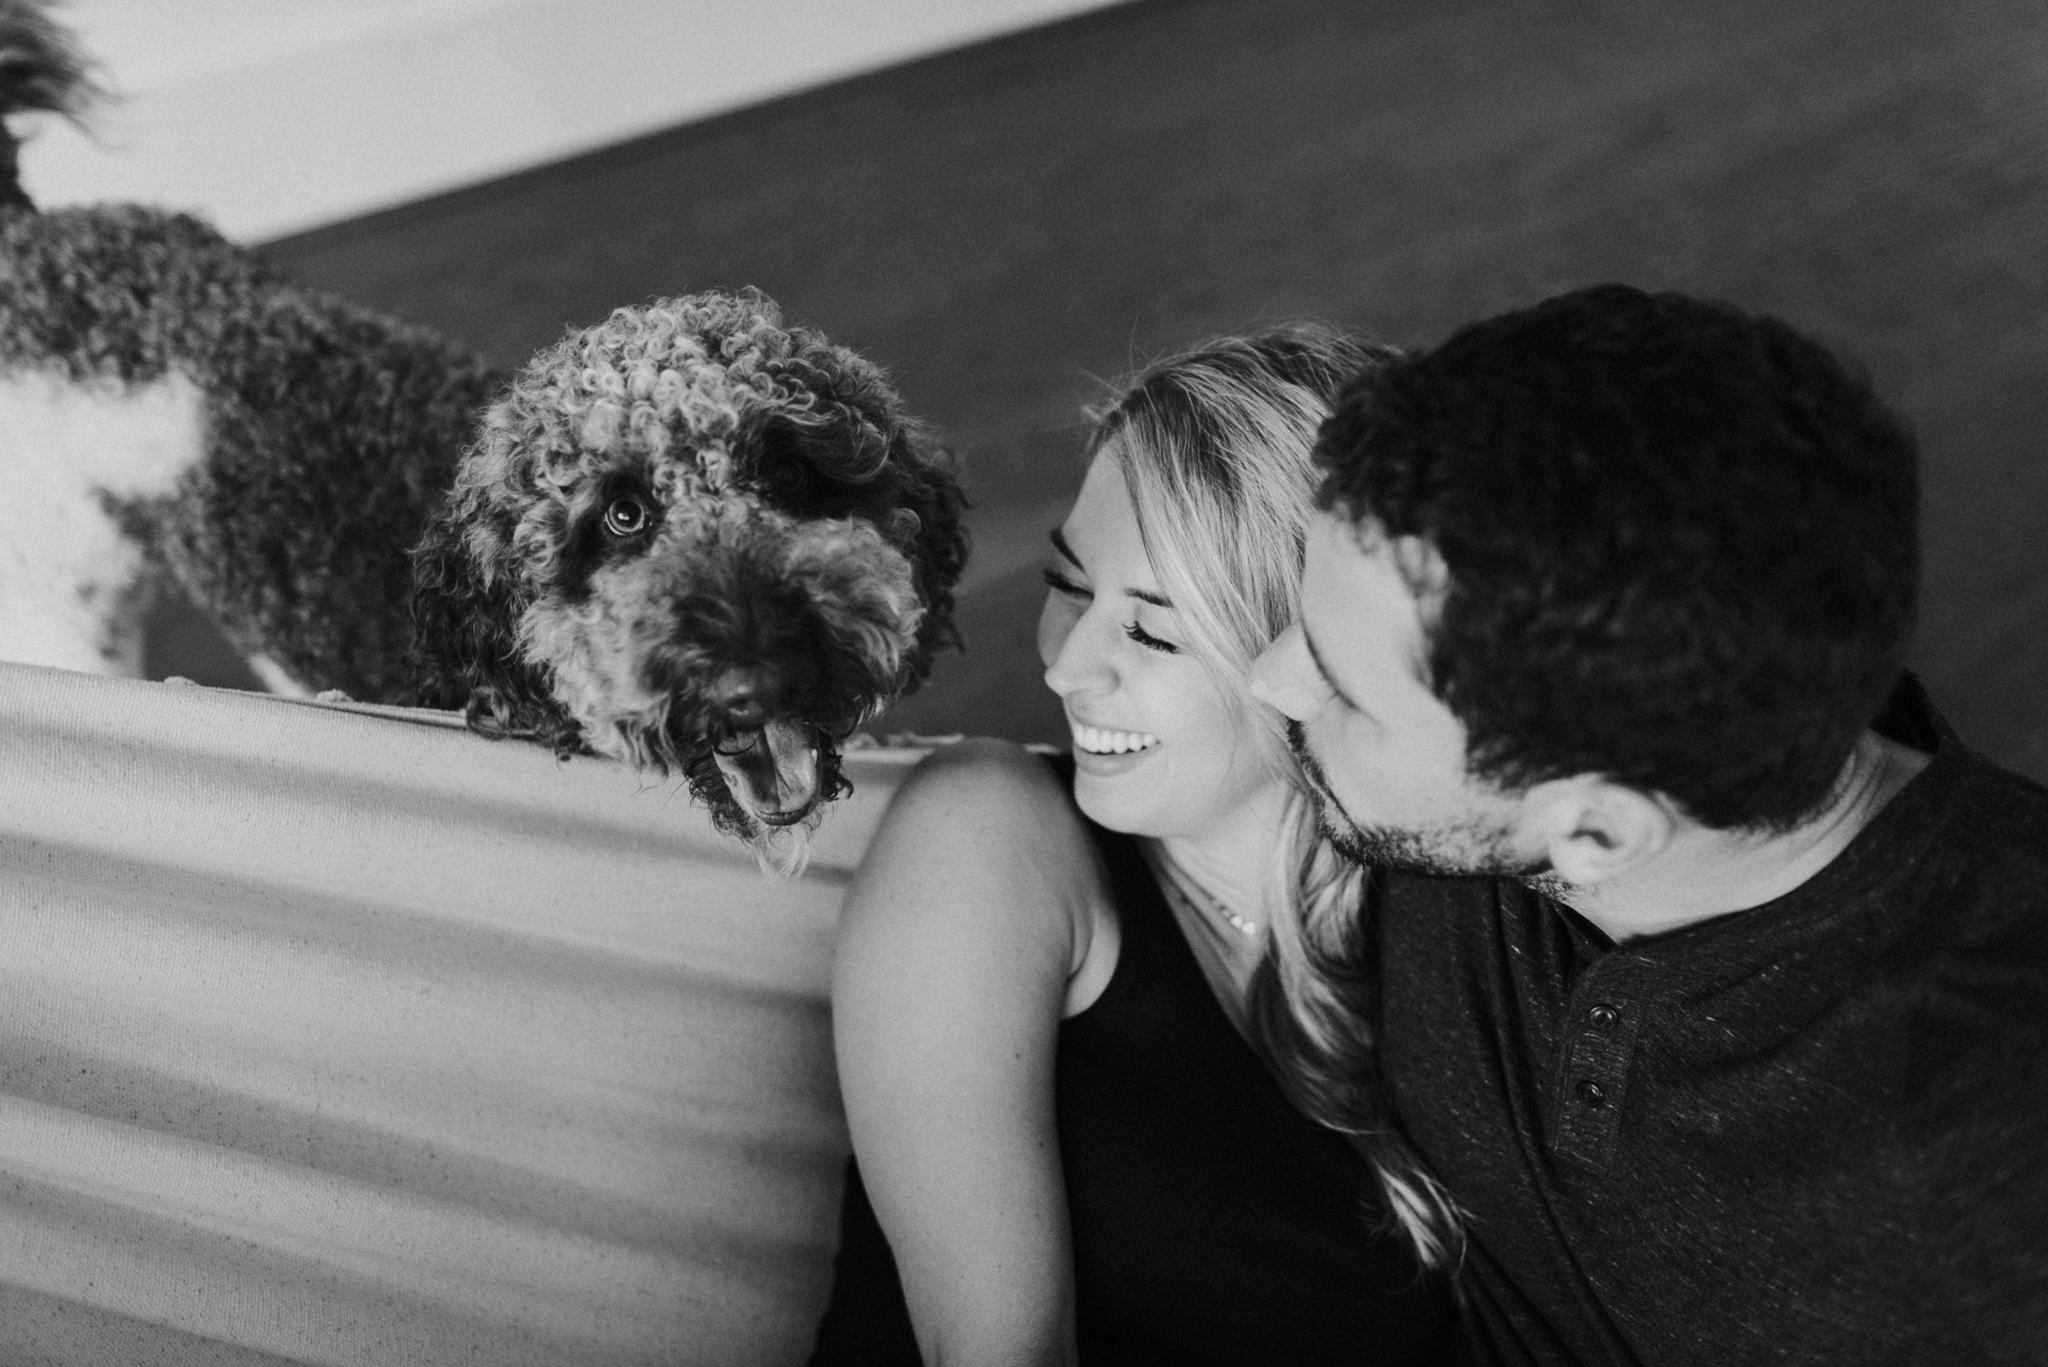 Houston Wedding Photographer-Houston In Home Engagement Session- Houston Wedding Photographer -Kristen Giles Photography-60.jpg